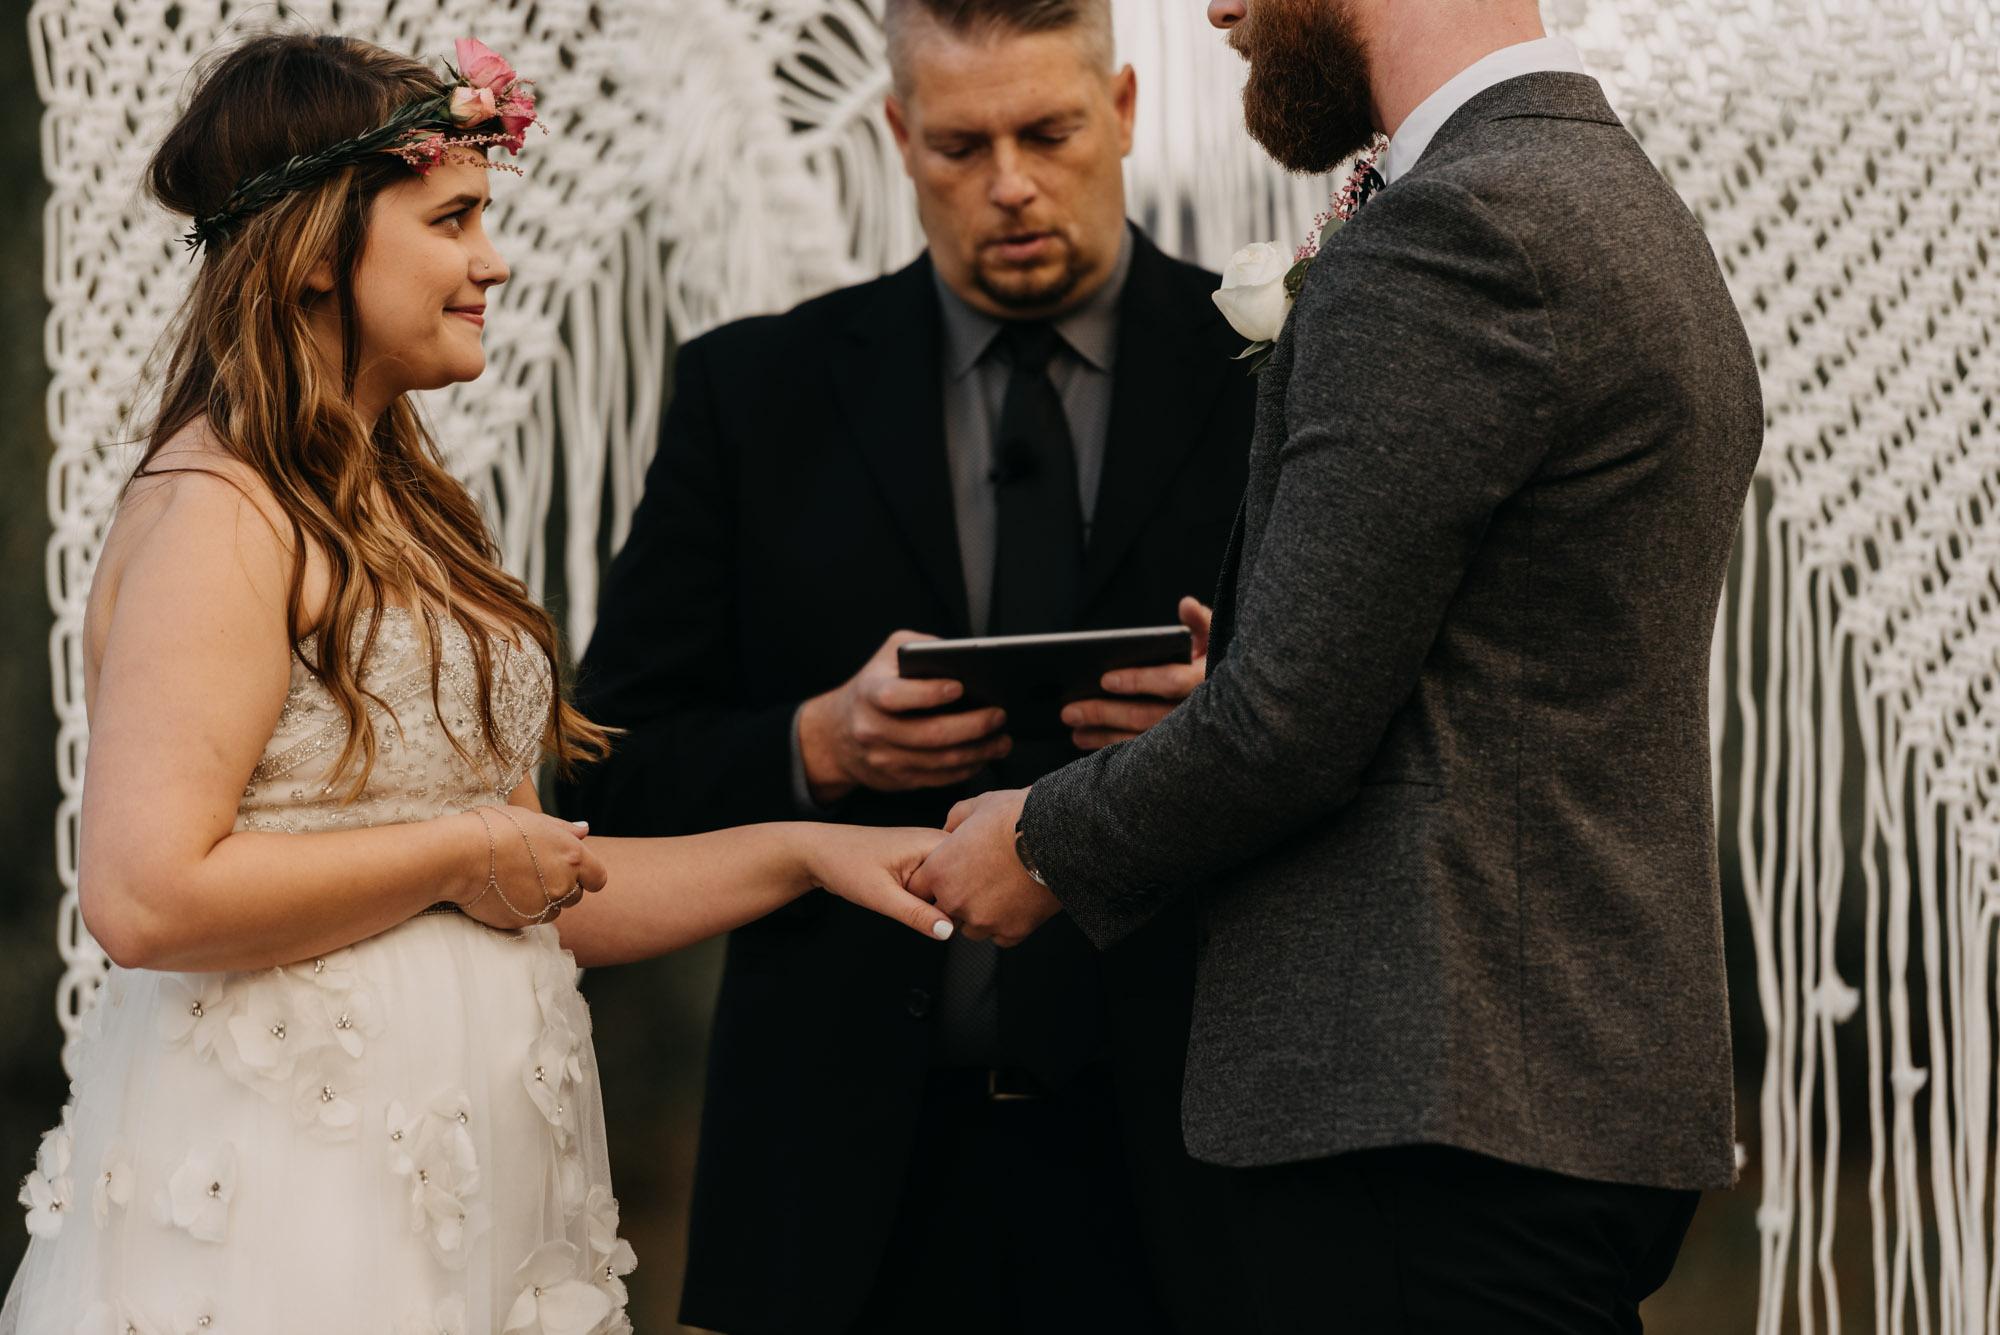 Outdoor-Summer-Ceremony-Washington-Wedding-Rainbow-9114.jpg